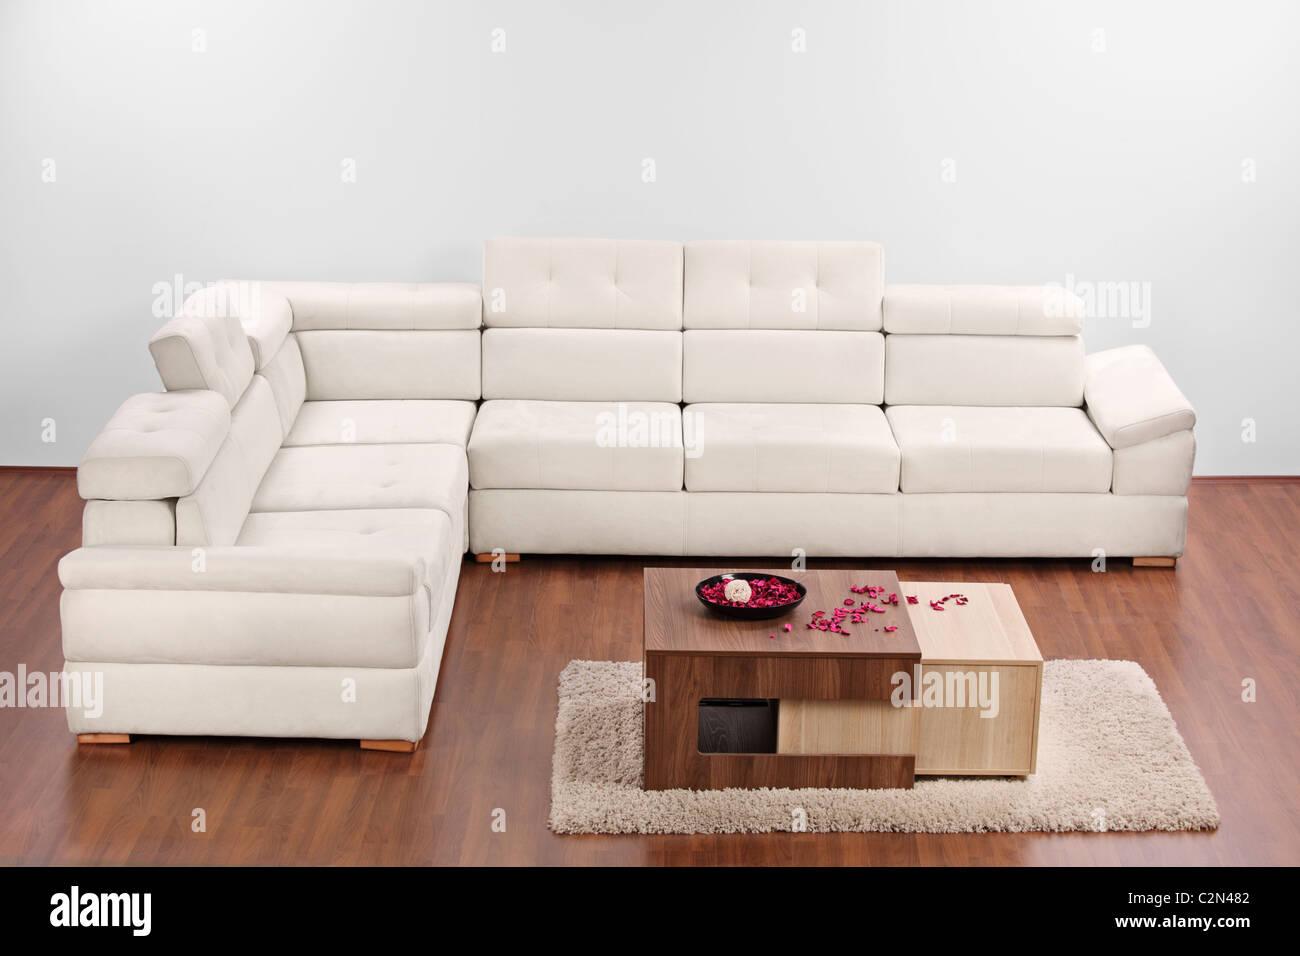 A Studio Shot Of Modern Minimalist Living Room With Furniture